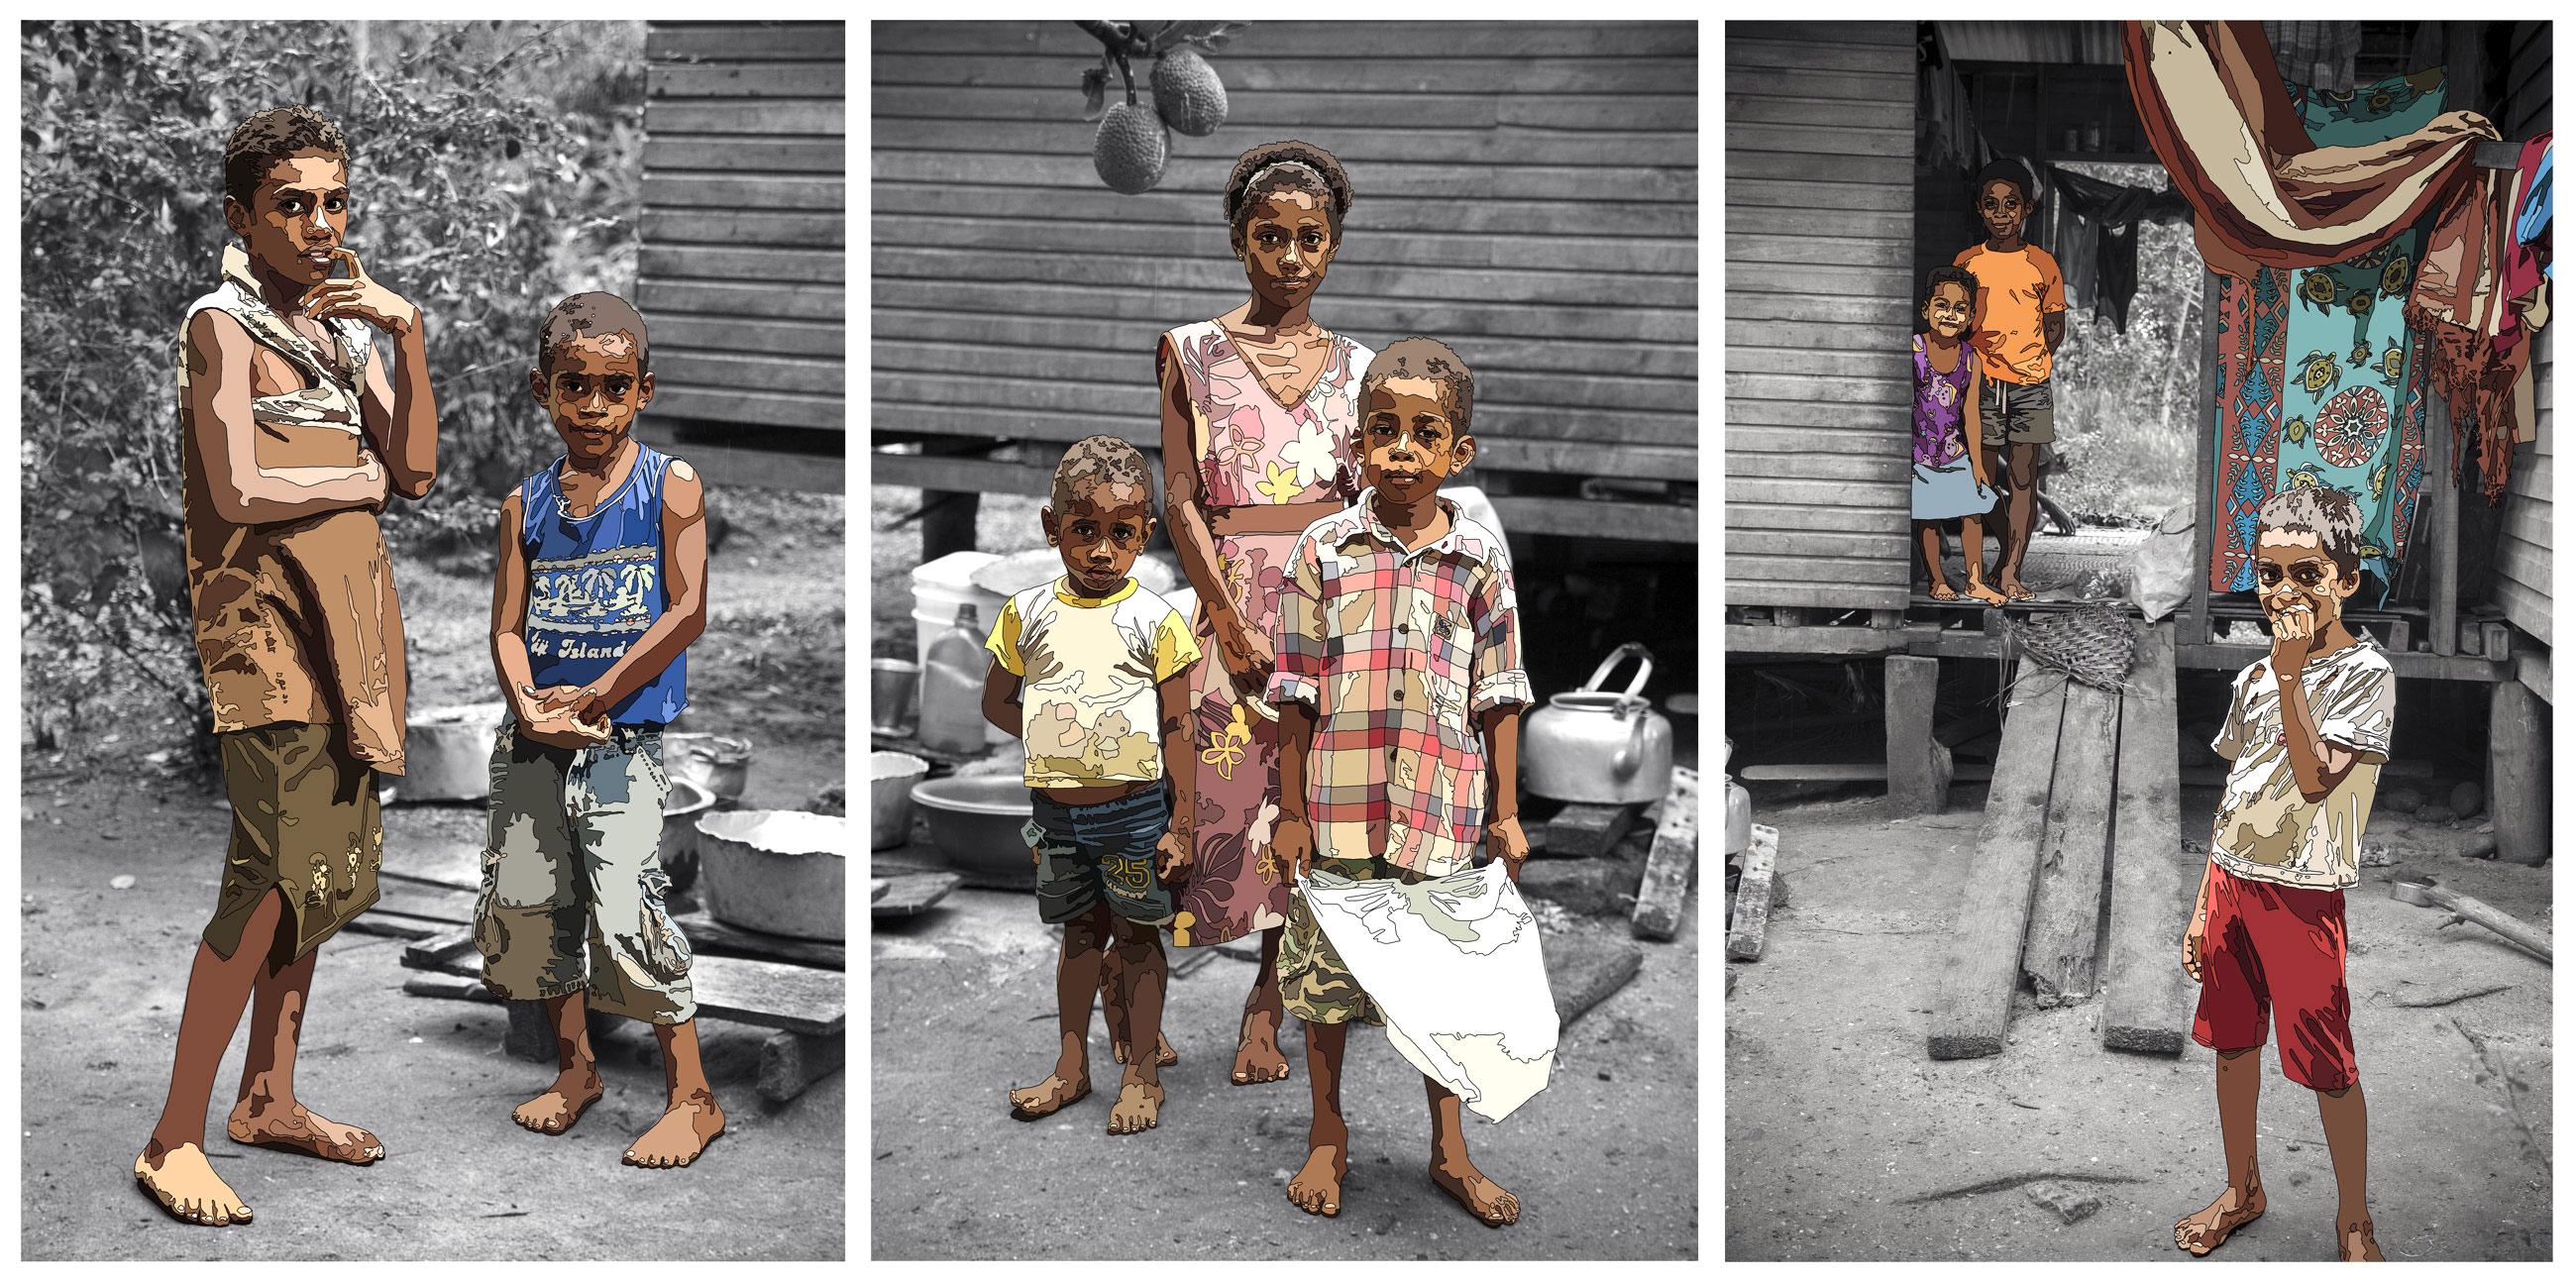 Nakasa Village Triptych by Anastasia Parmson